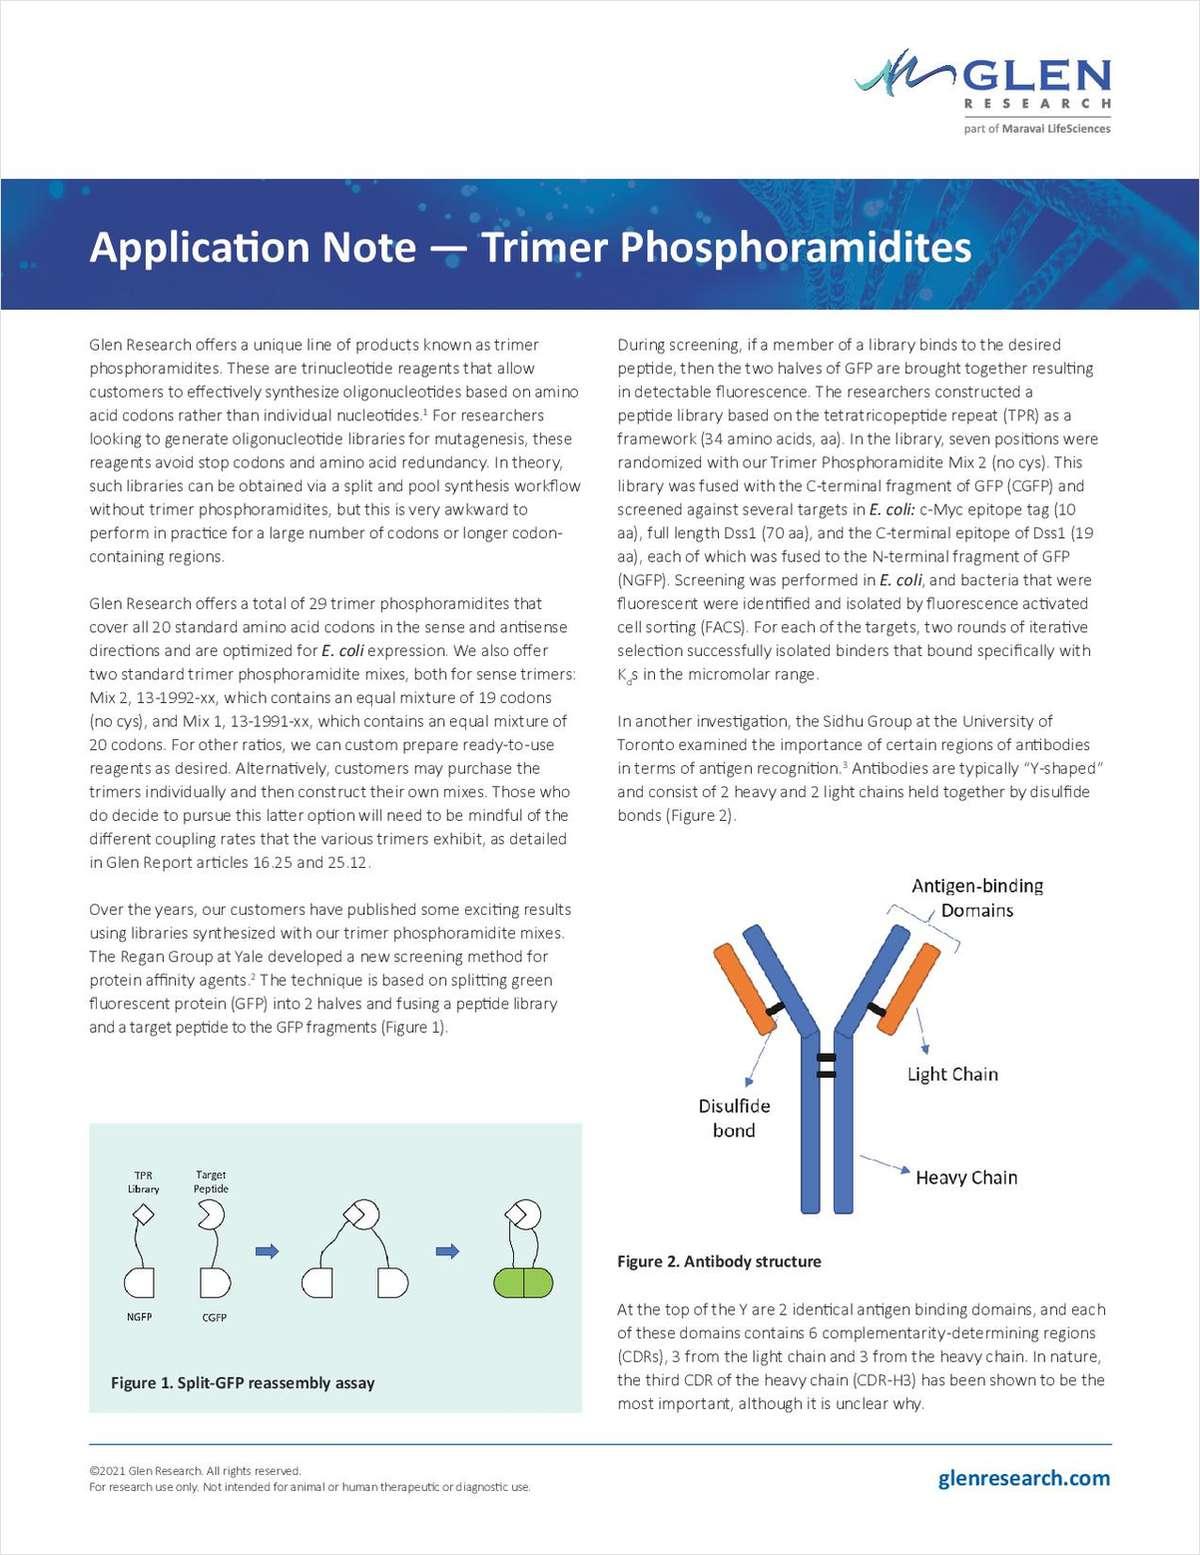 Application Note - Trimer Phosphoramidites